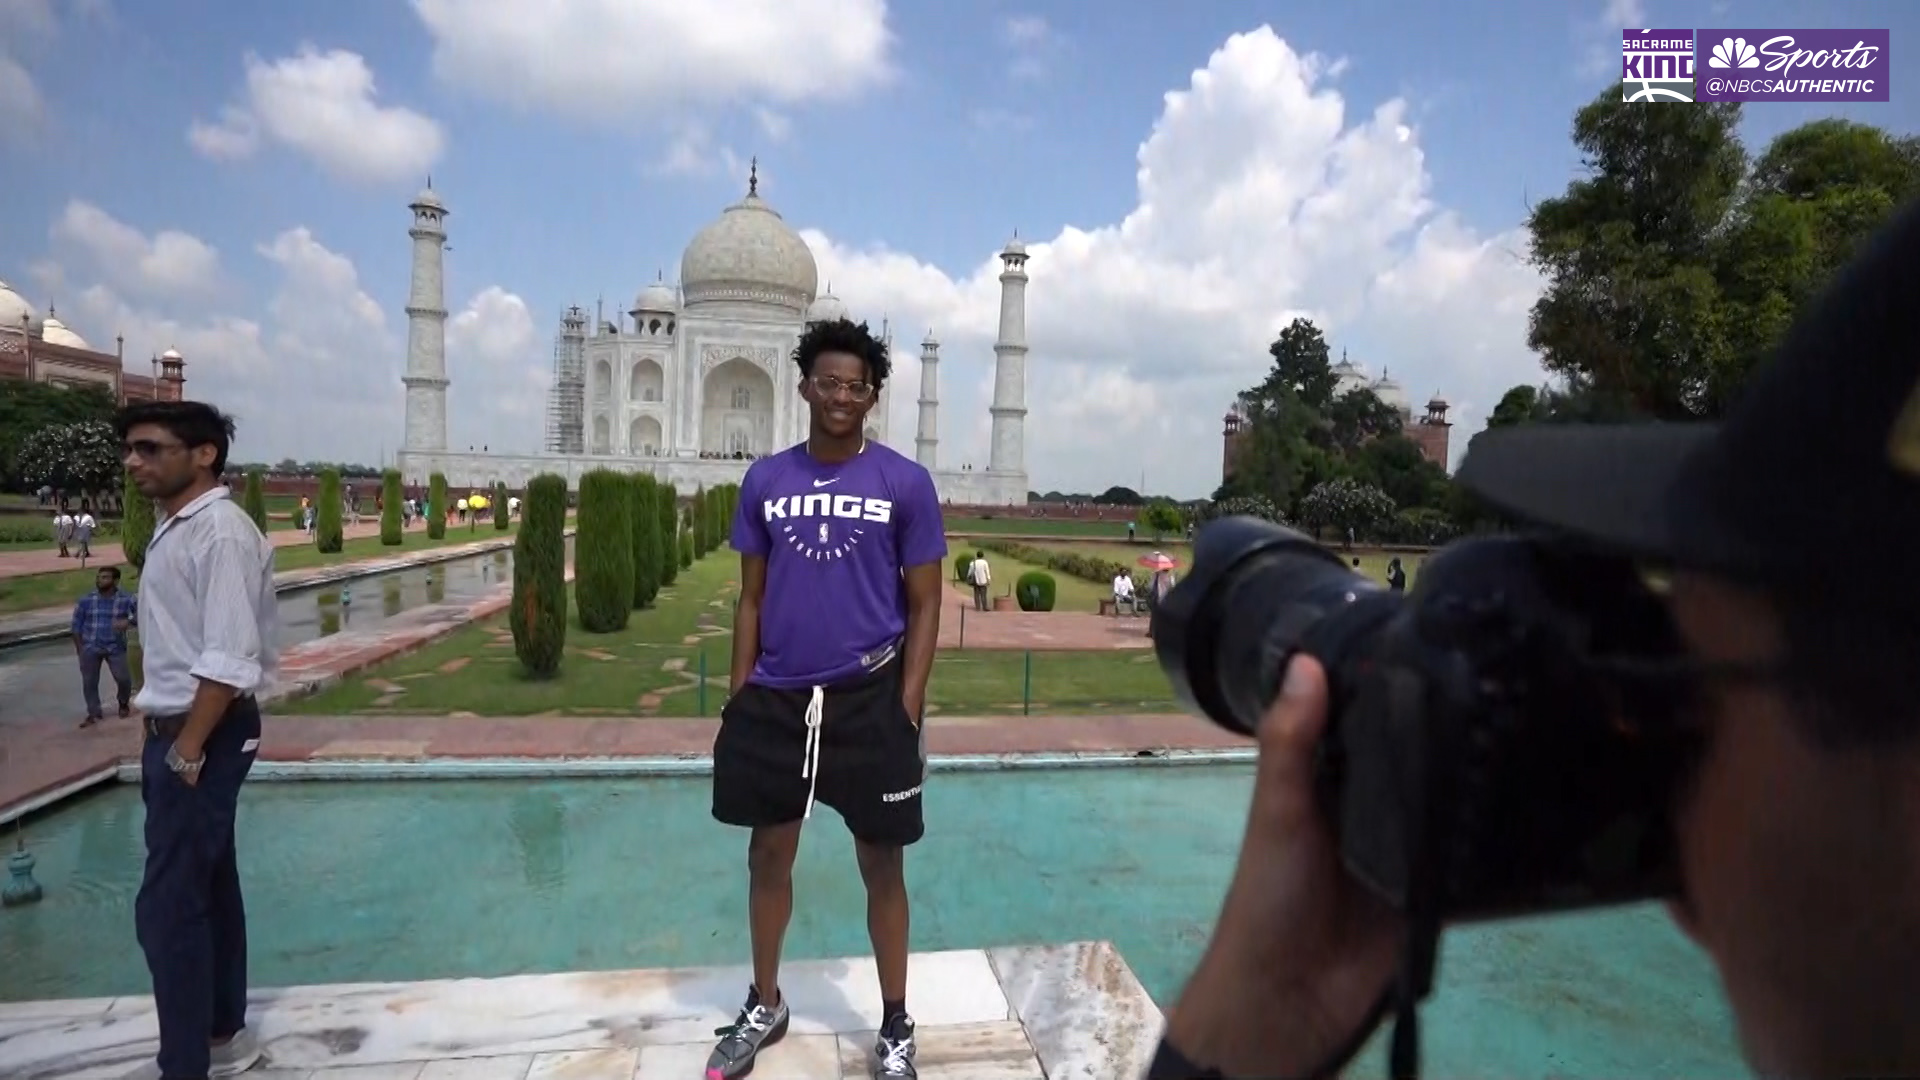 Vivek Ranadive: Sacramento Kings trip to Taj Mahal 'beyond words'